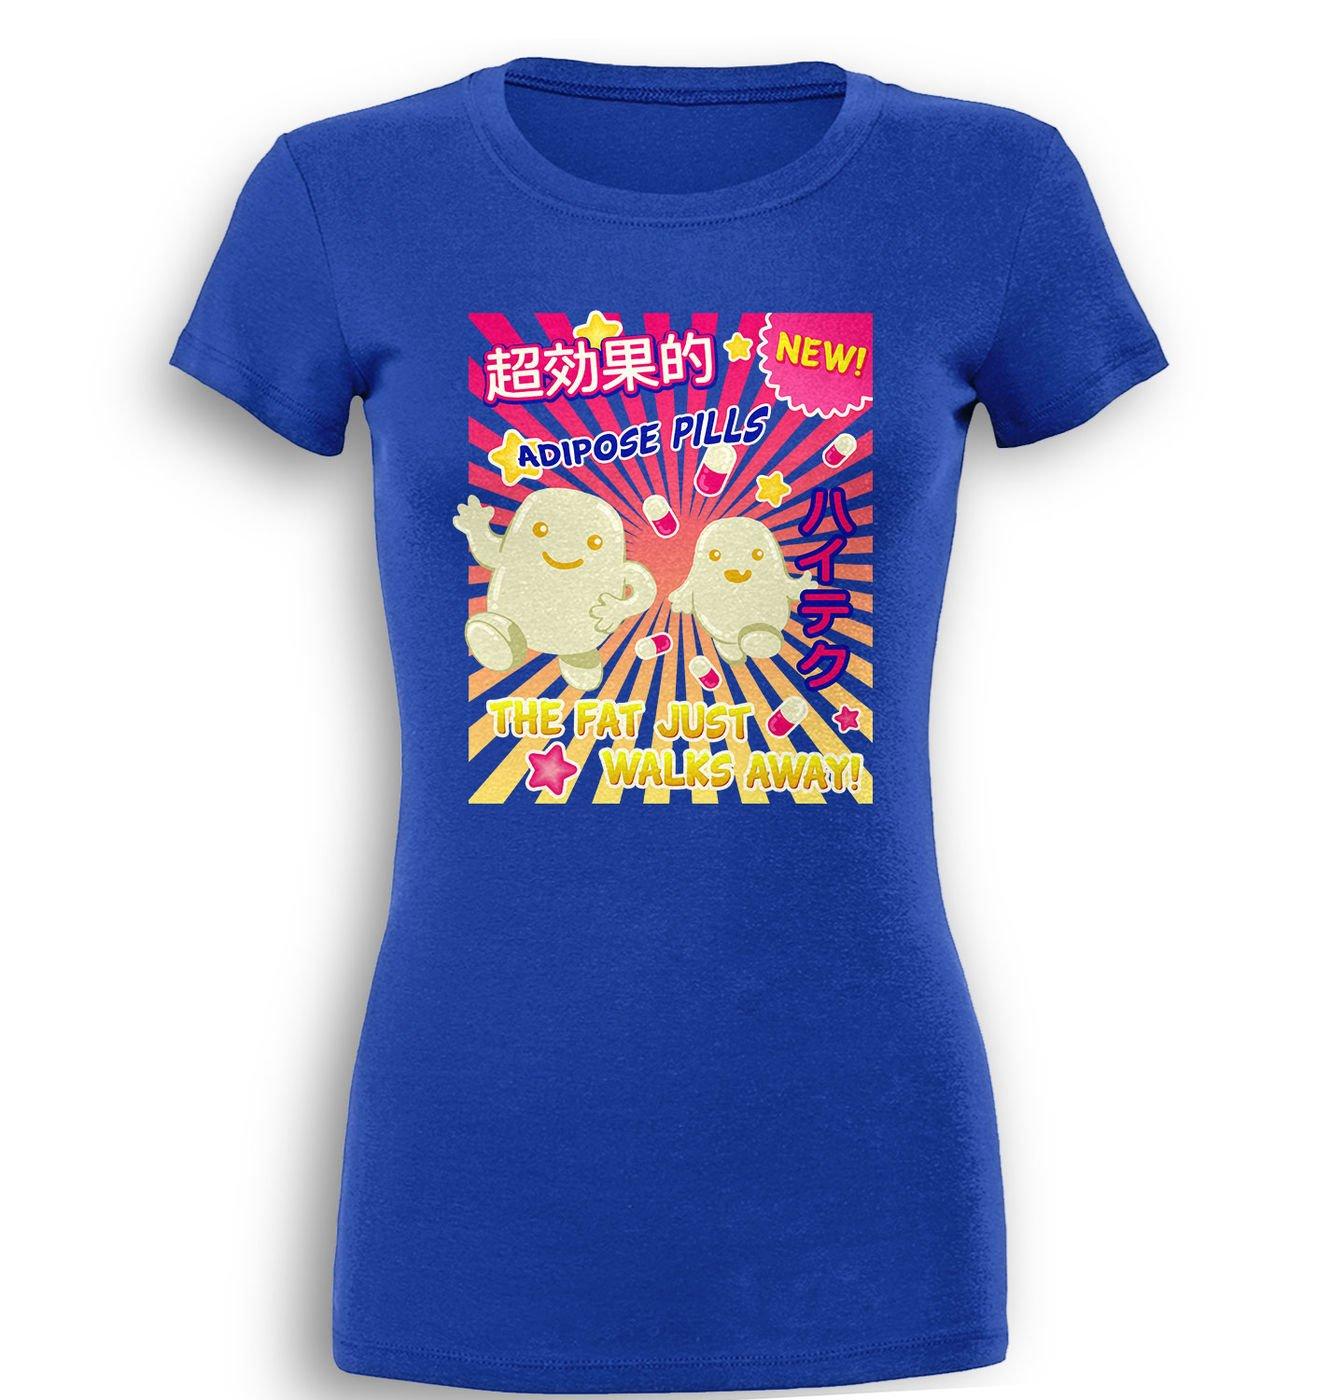 Kawaii Adipose premium women's t-shirt by Something Geeky